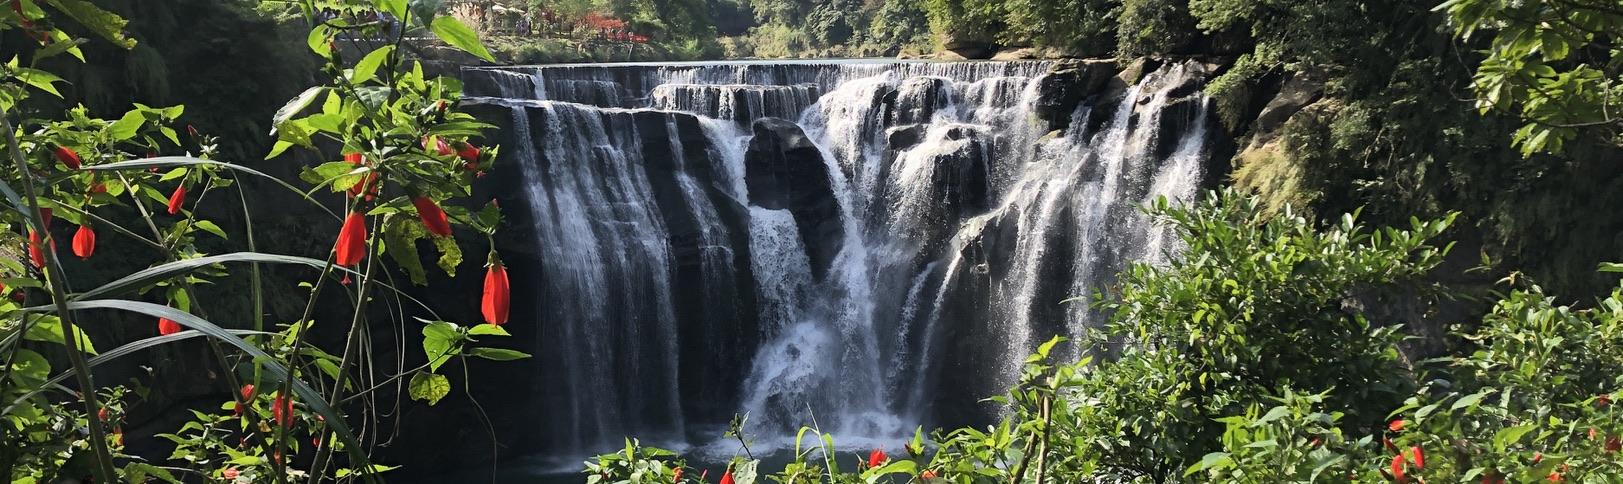 Shifen Waterfalls